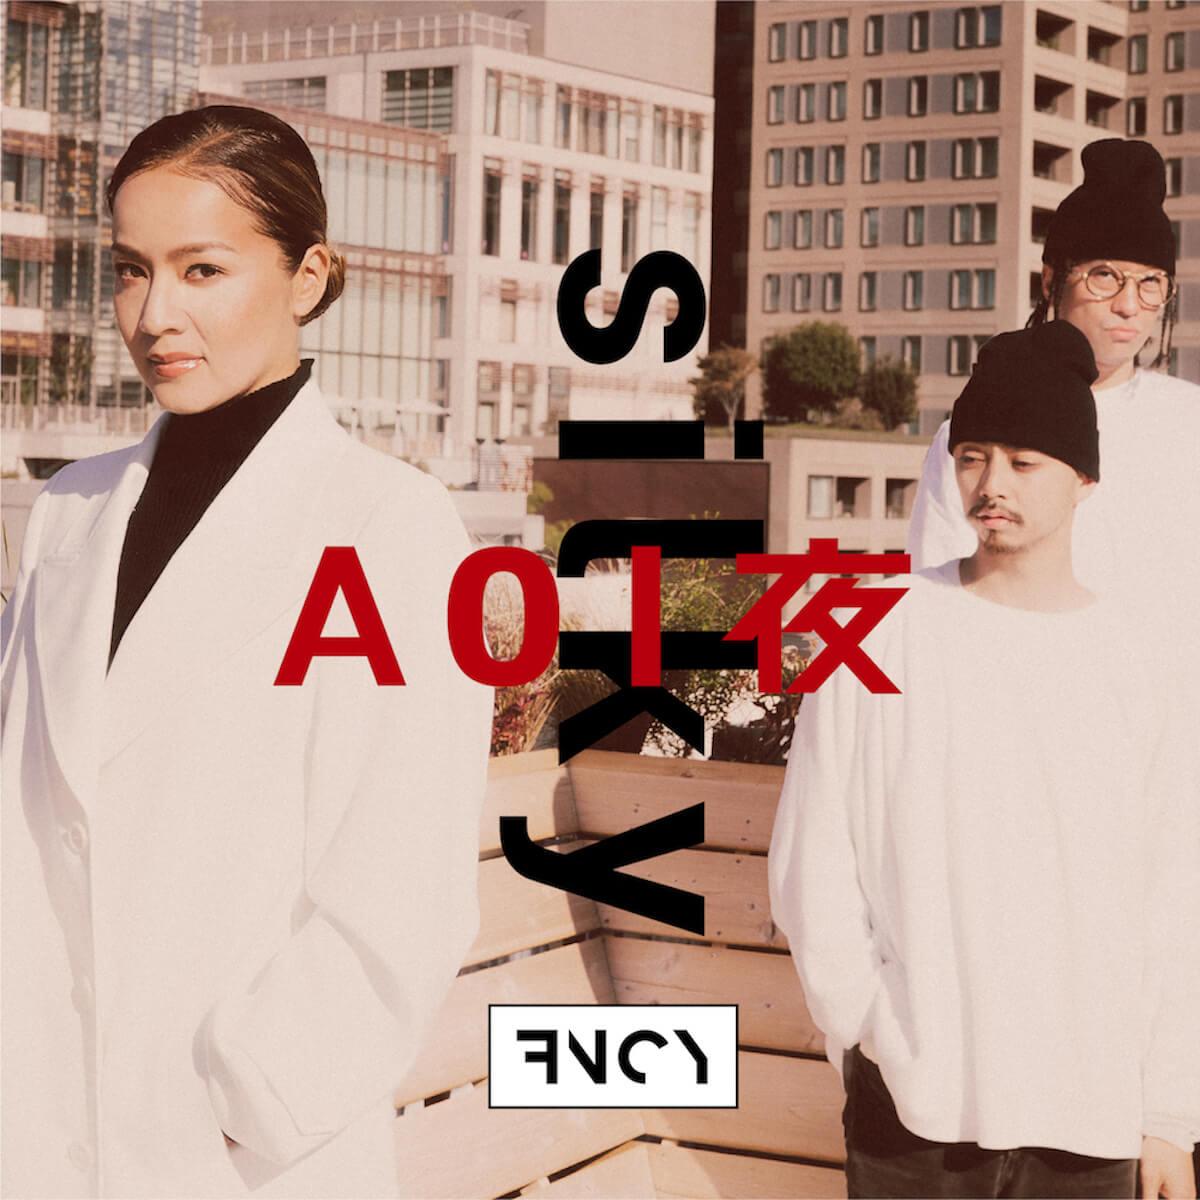 FNCYのPOP UP SHOPが今週末開催!X TOKYOとのコラボスニーカー、石黒景太氏デザインのフーディなどを販売 FNCY_7inch_JK